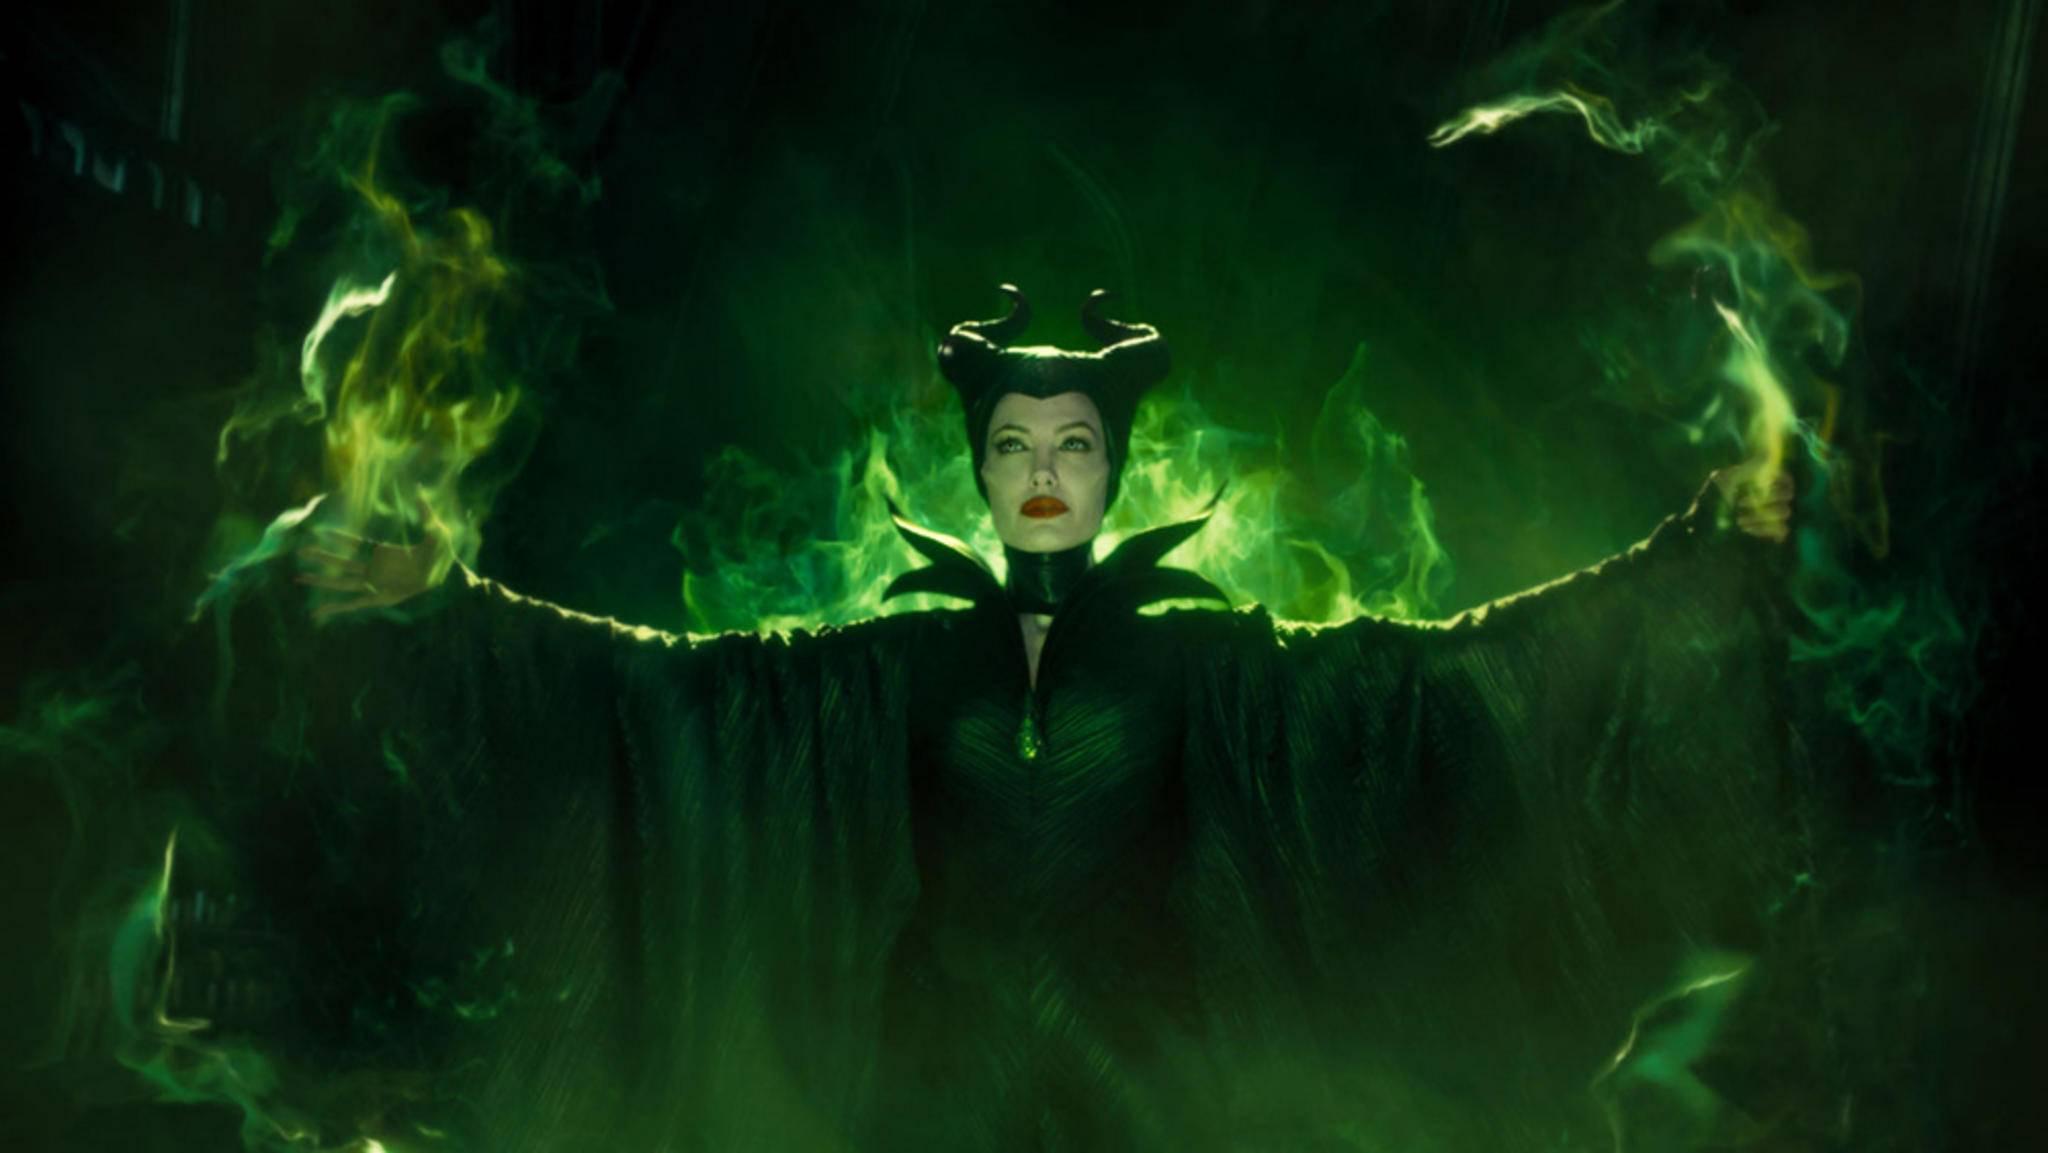 Drehbeginn: Maleficent zaubert wieder!